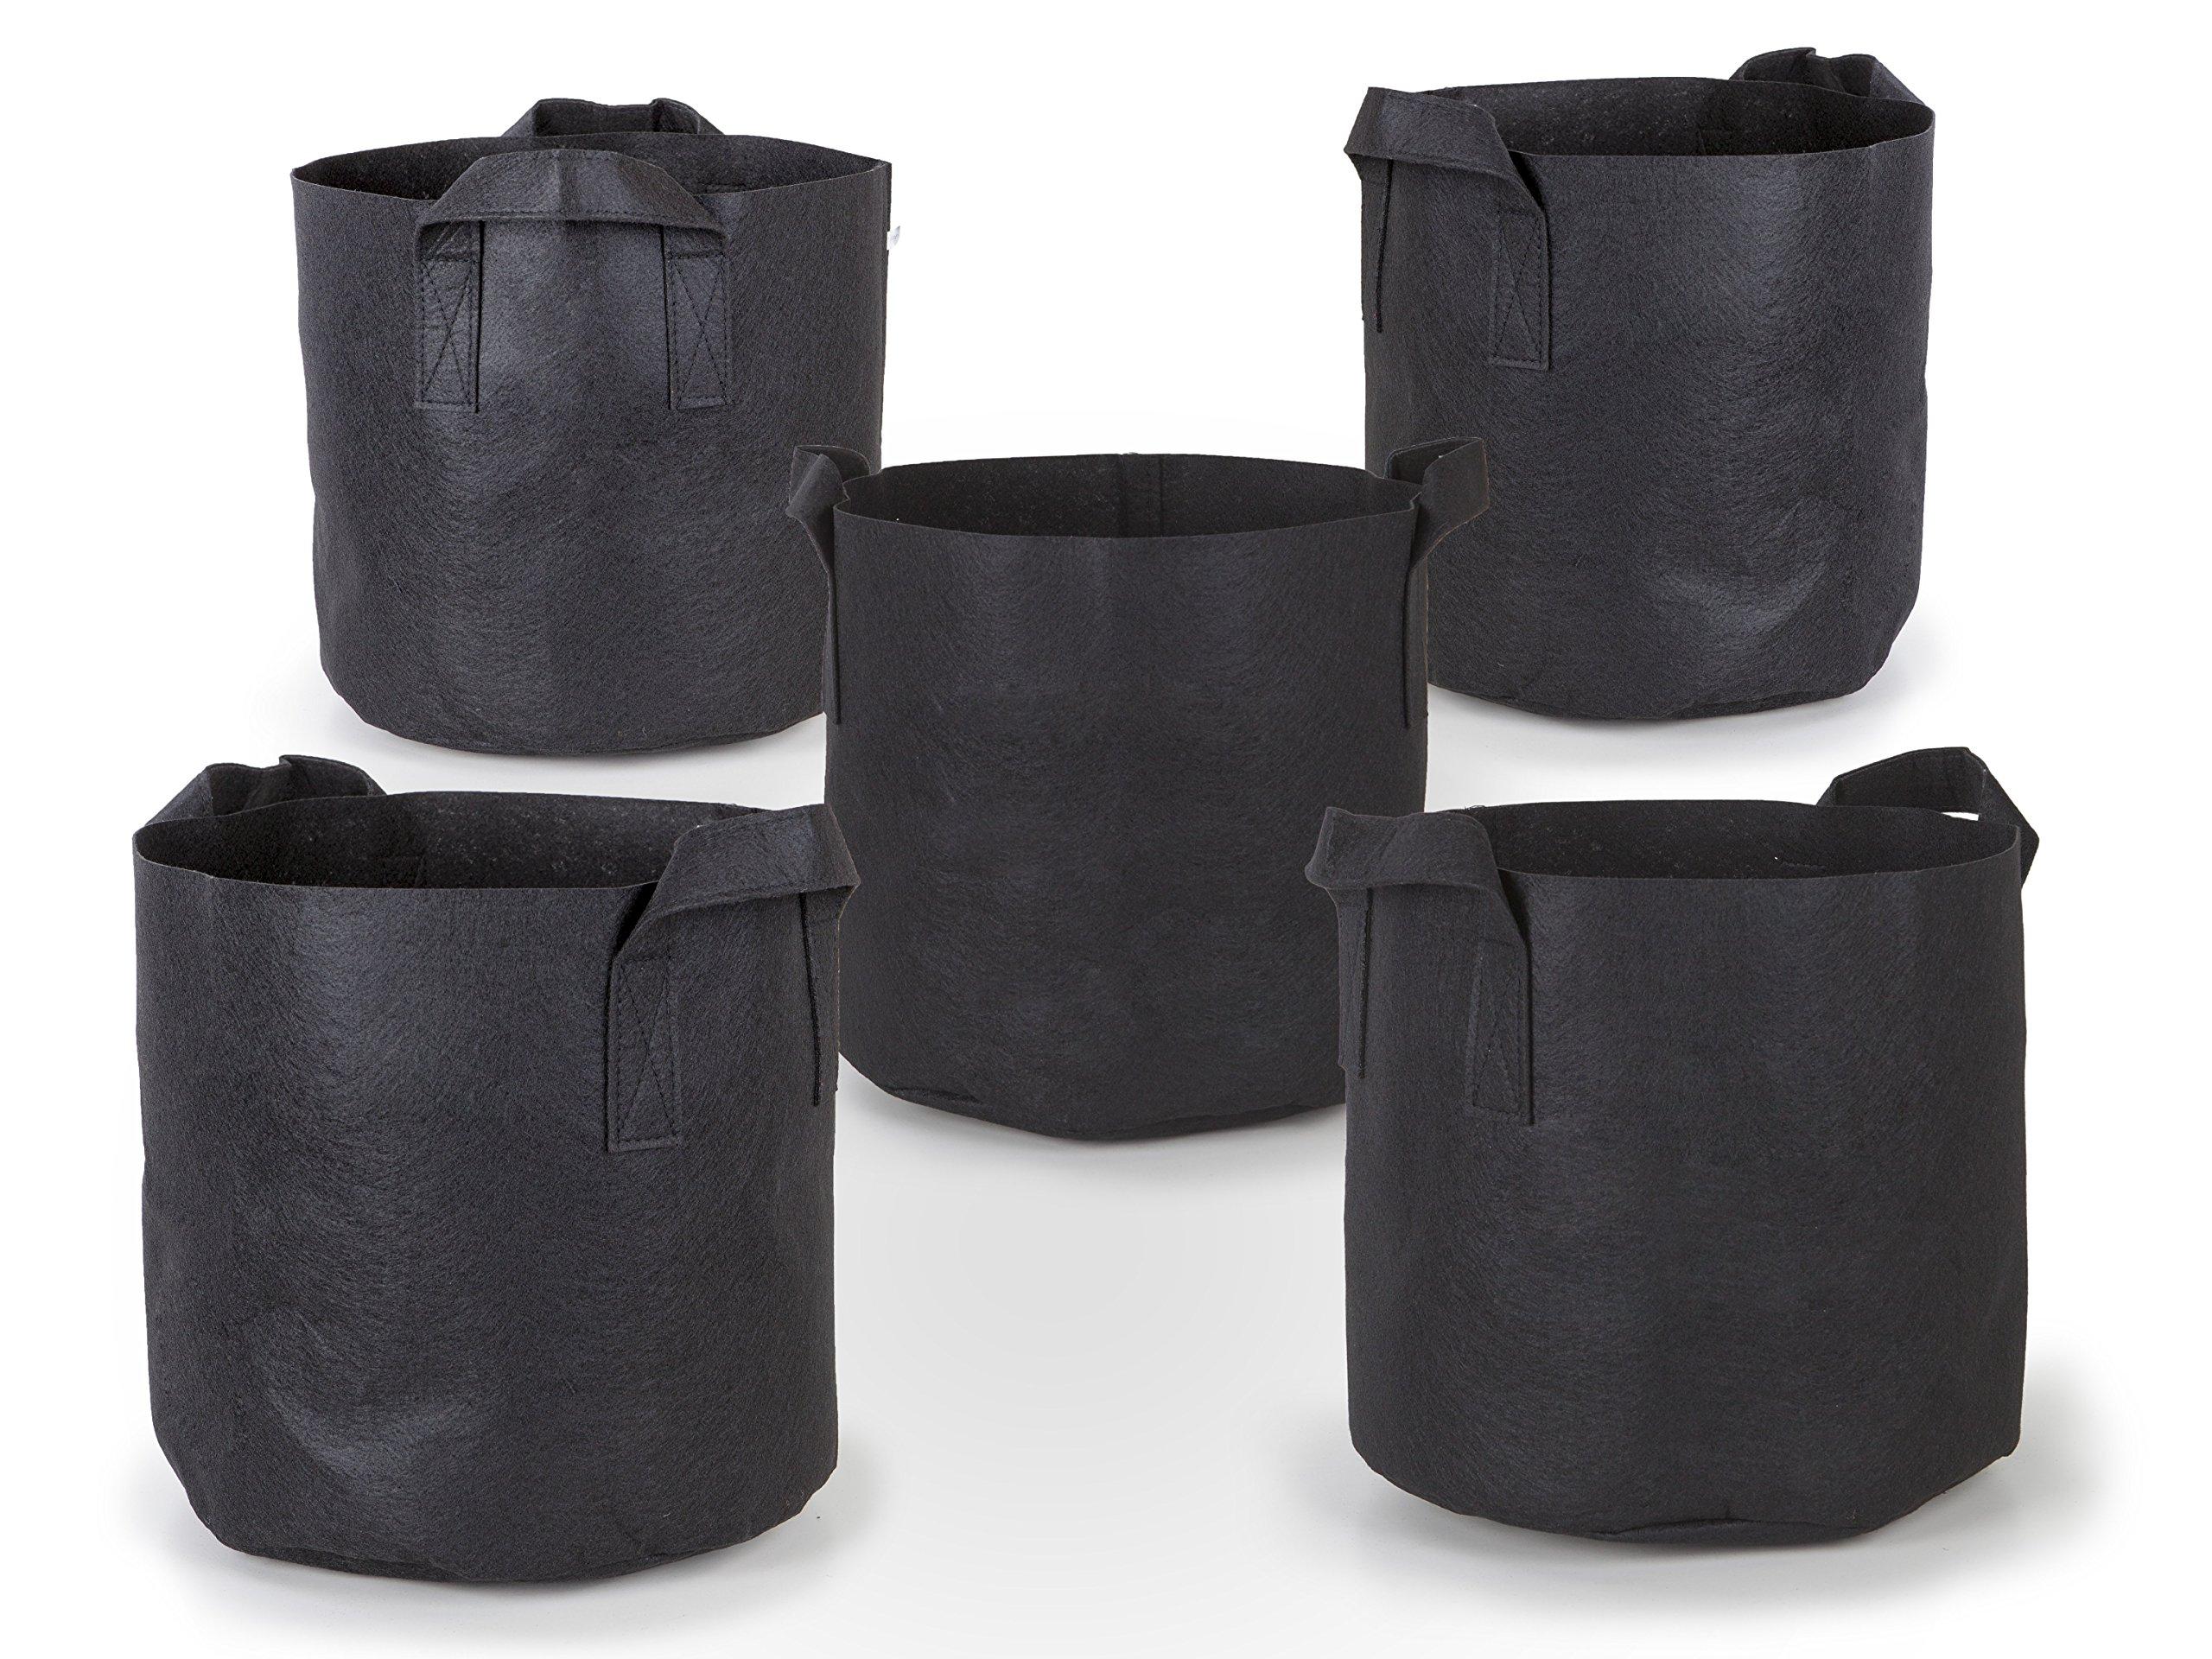 247Garden 5-Pack 10 Gallon Grow Bags/Aeration Fabric Pots w/Handles (Black) by 247Garden